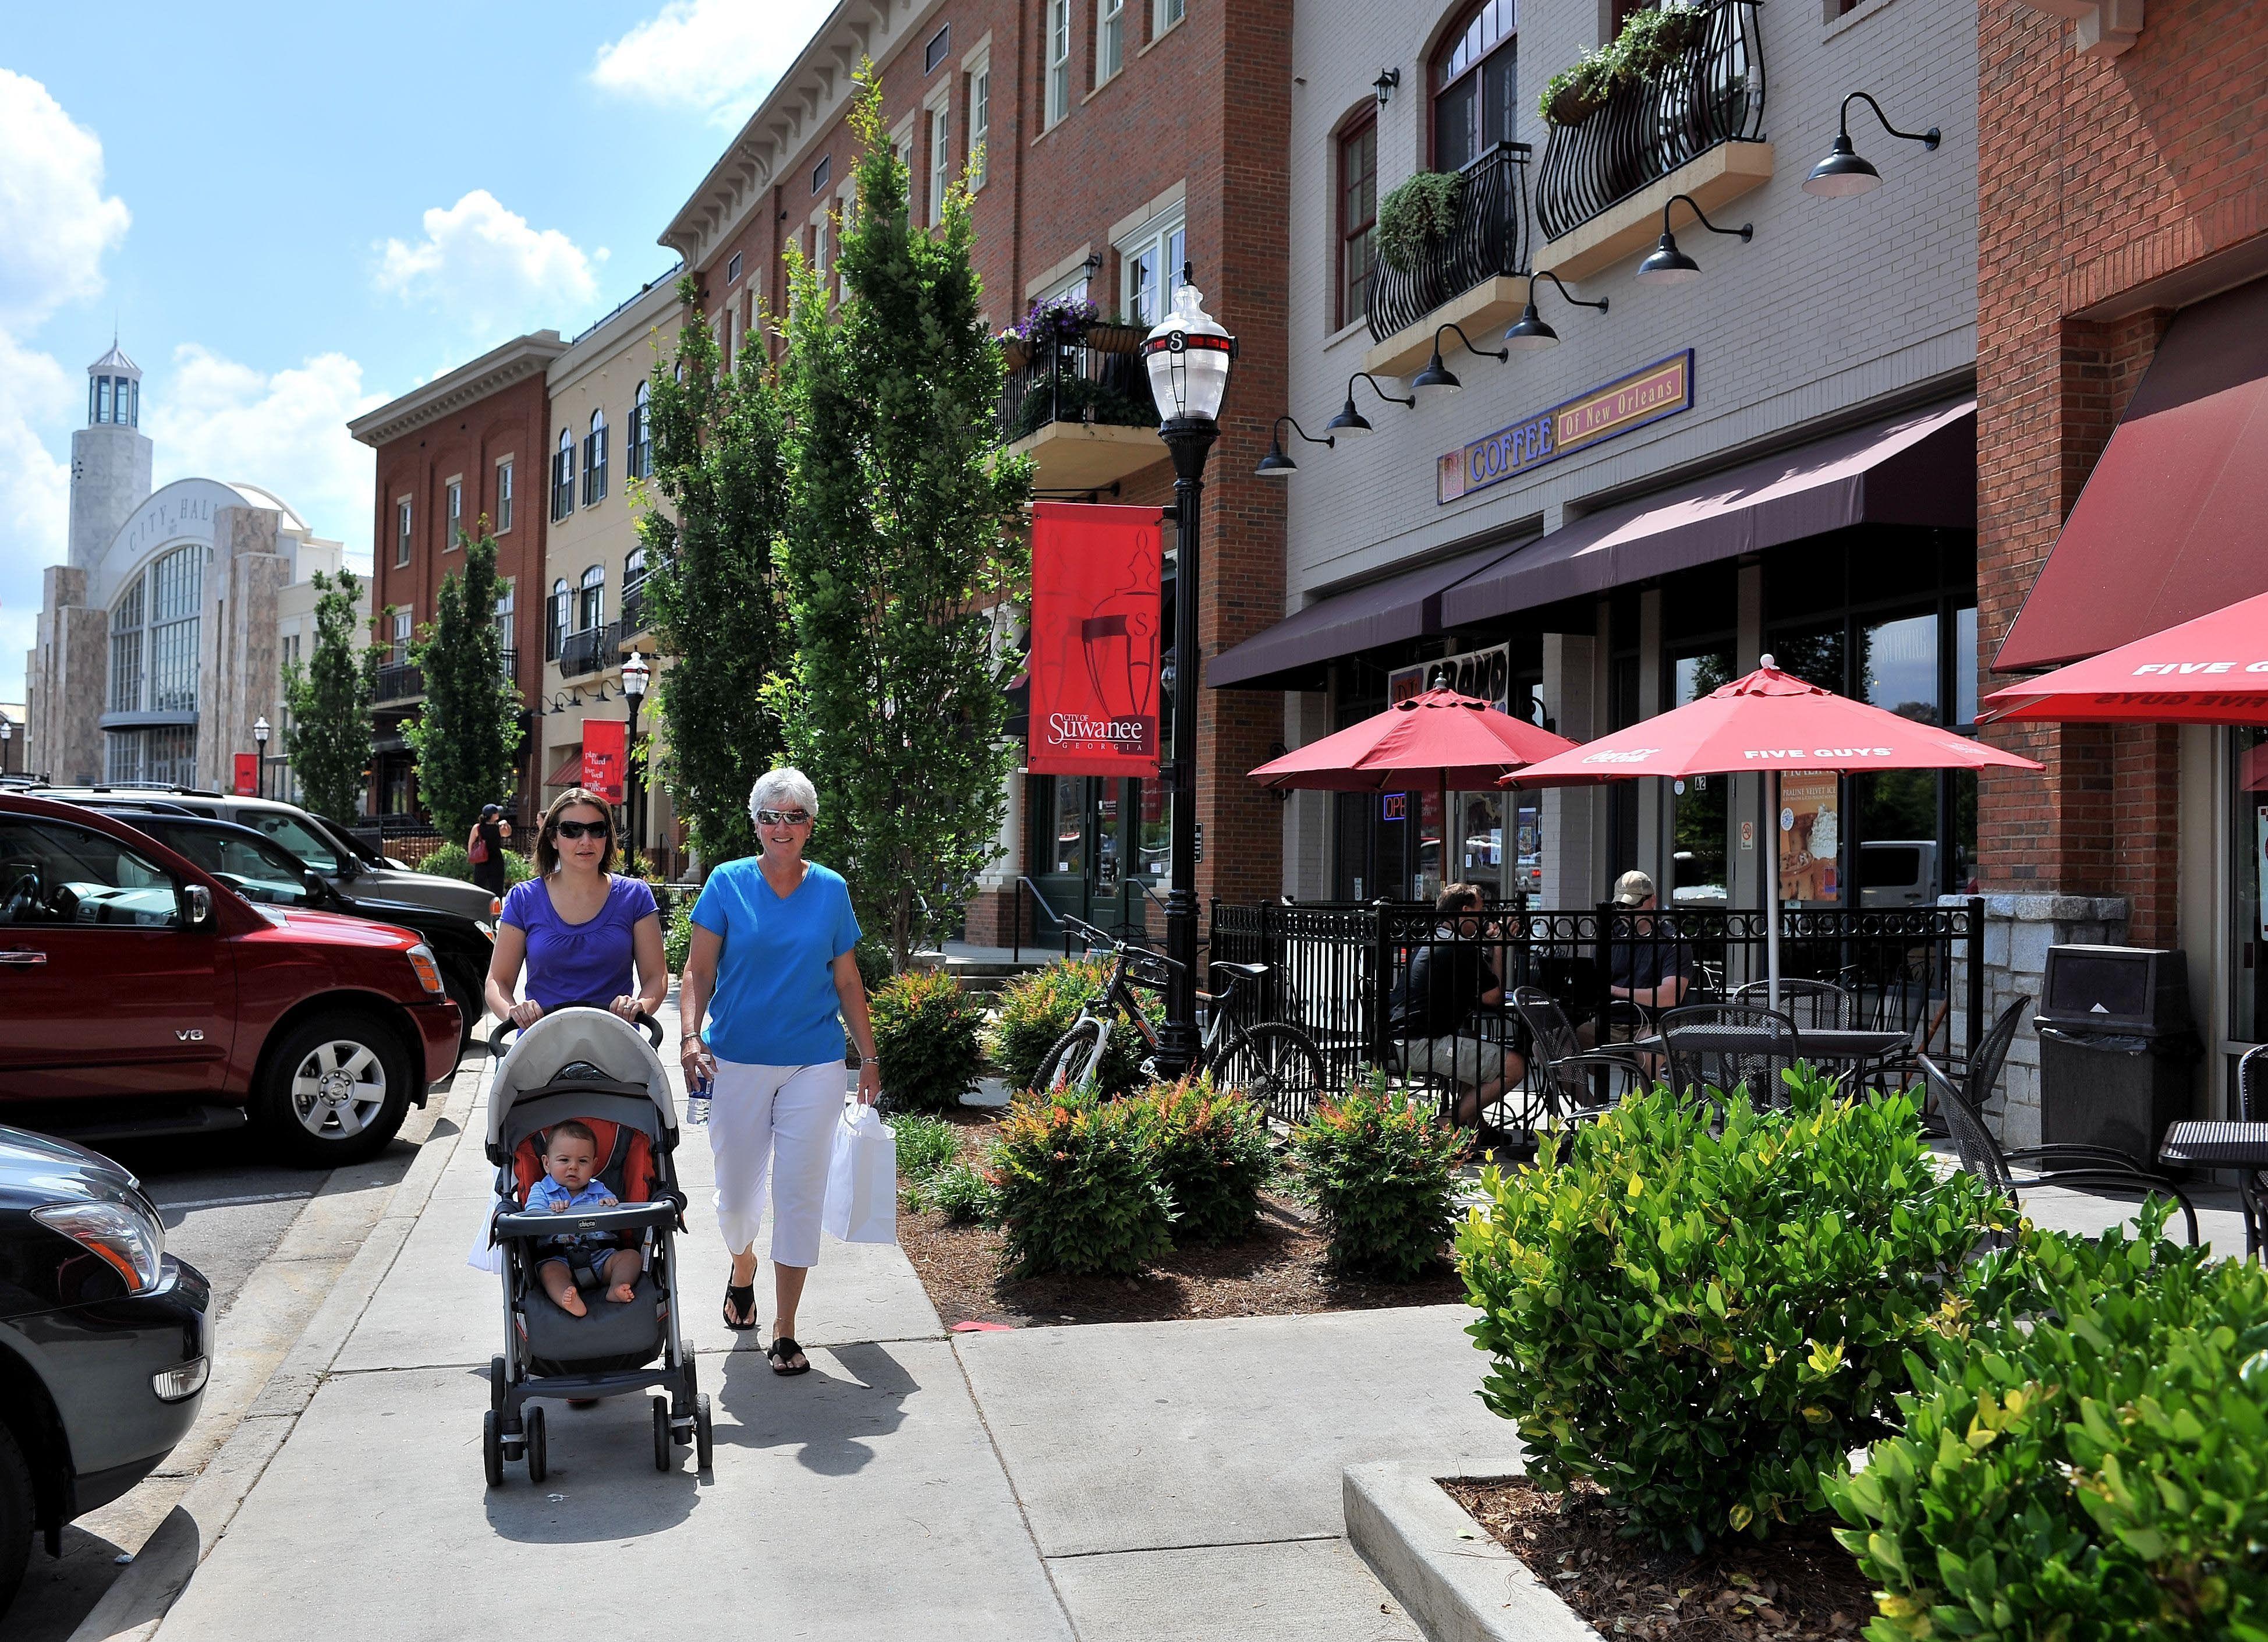 Suwanee, GA: The heart of Suwanee, the Town Center houses